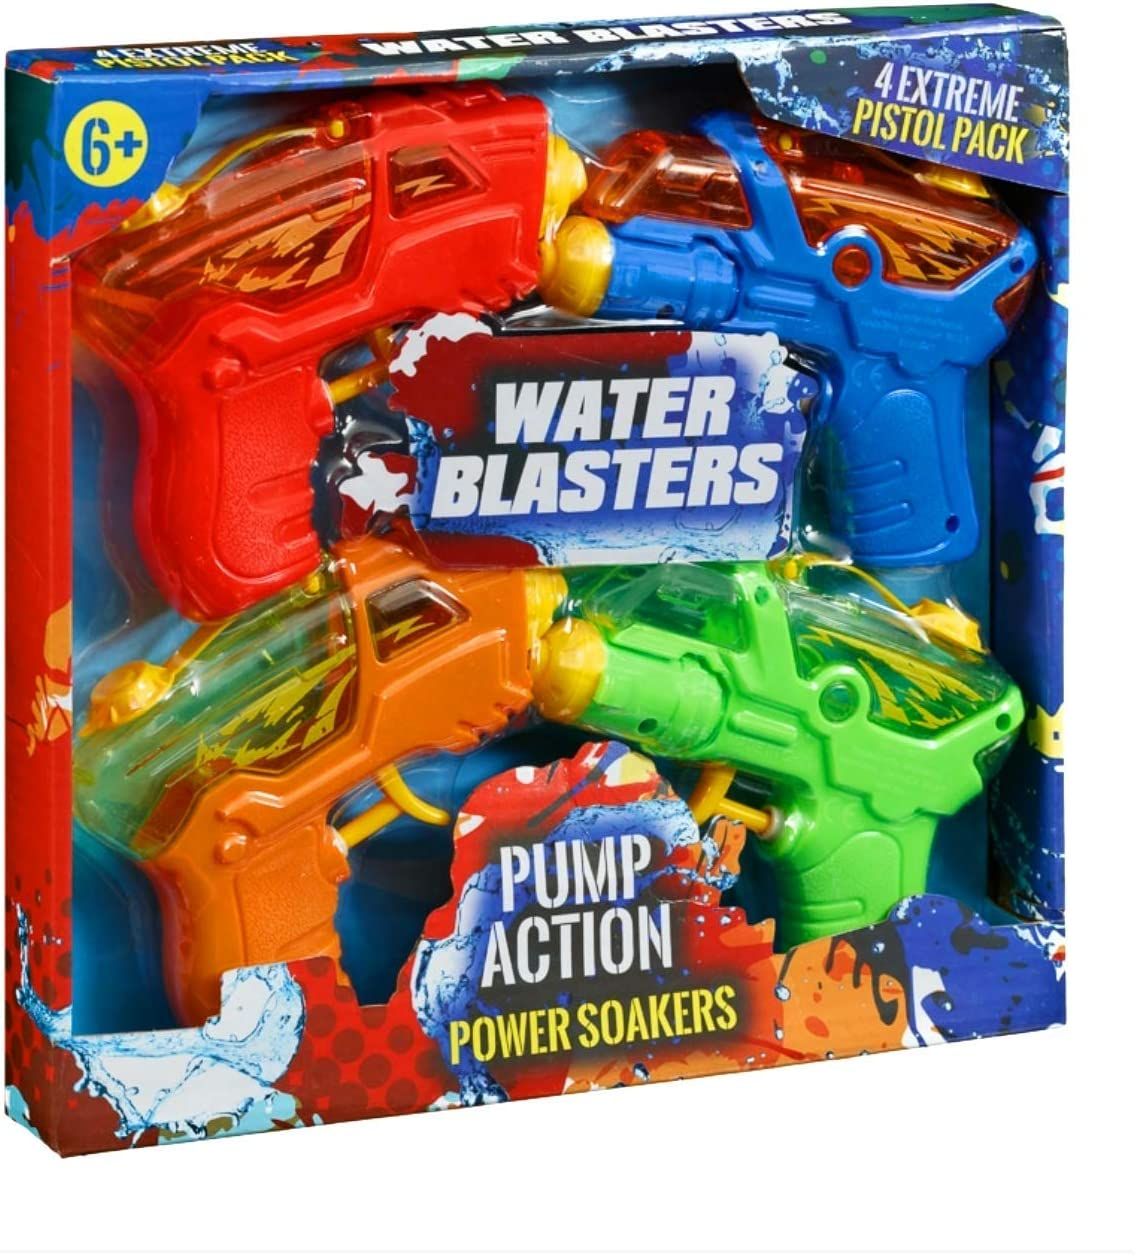 Acl Pump Action Power Soaker Water Gun 4pk Amazon Co Uk Toys Games